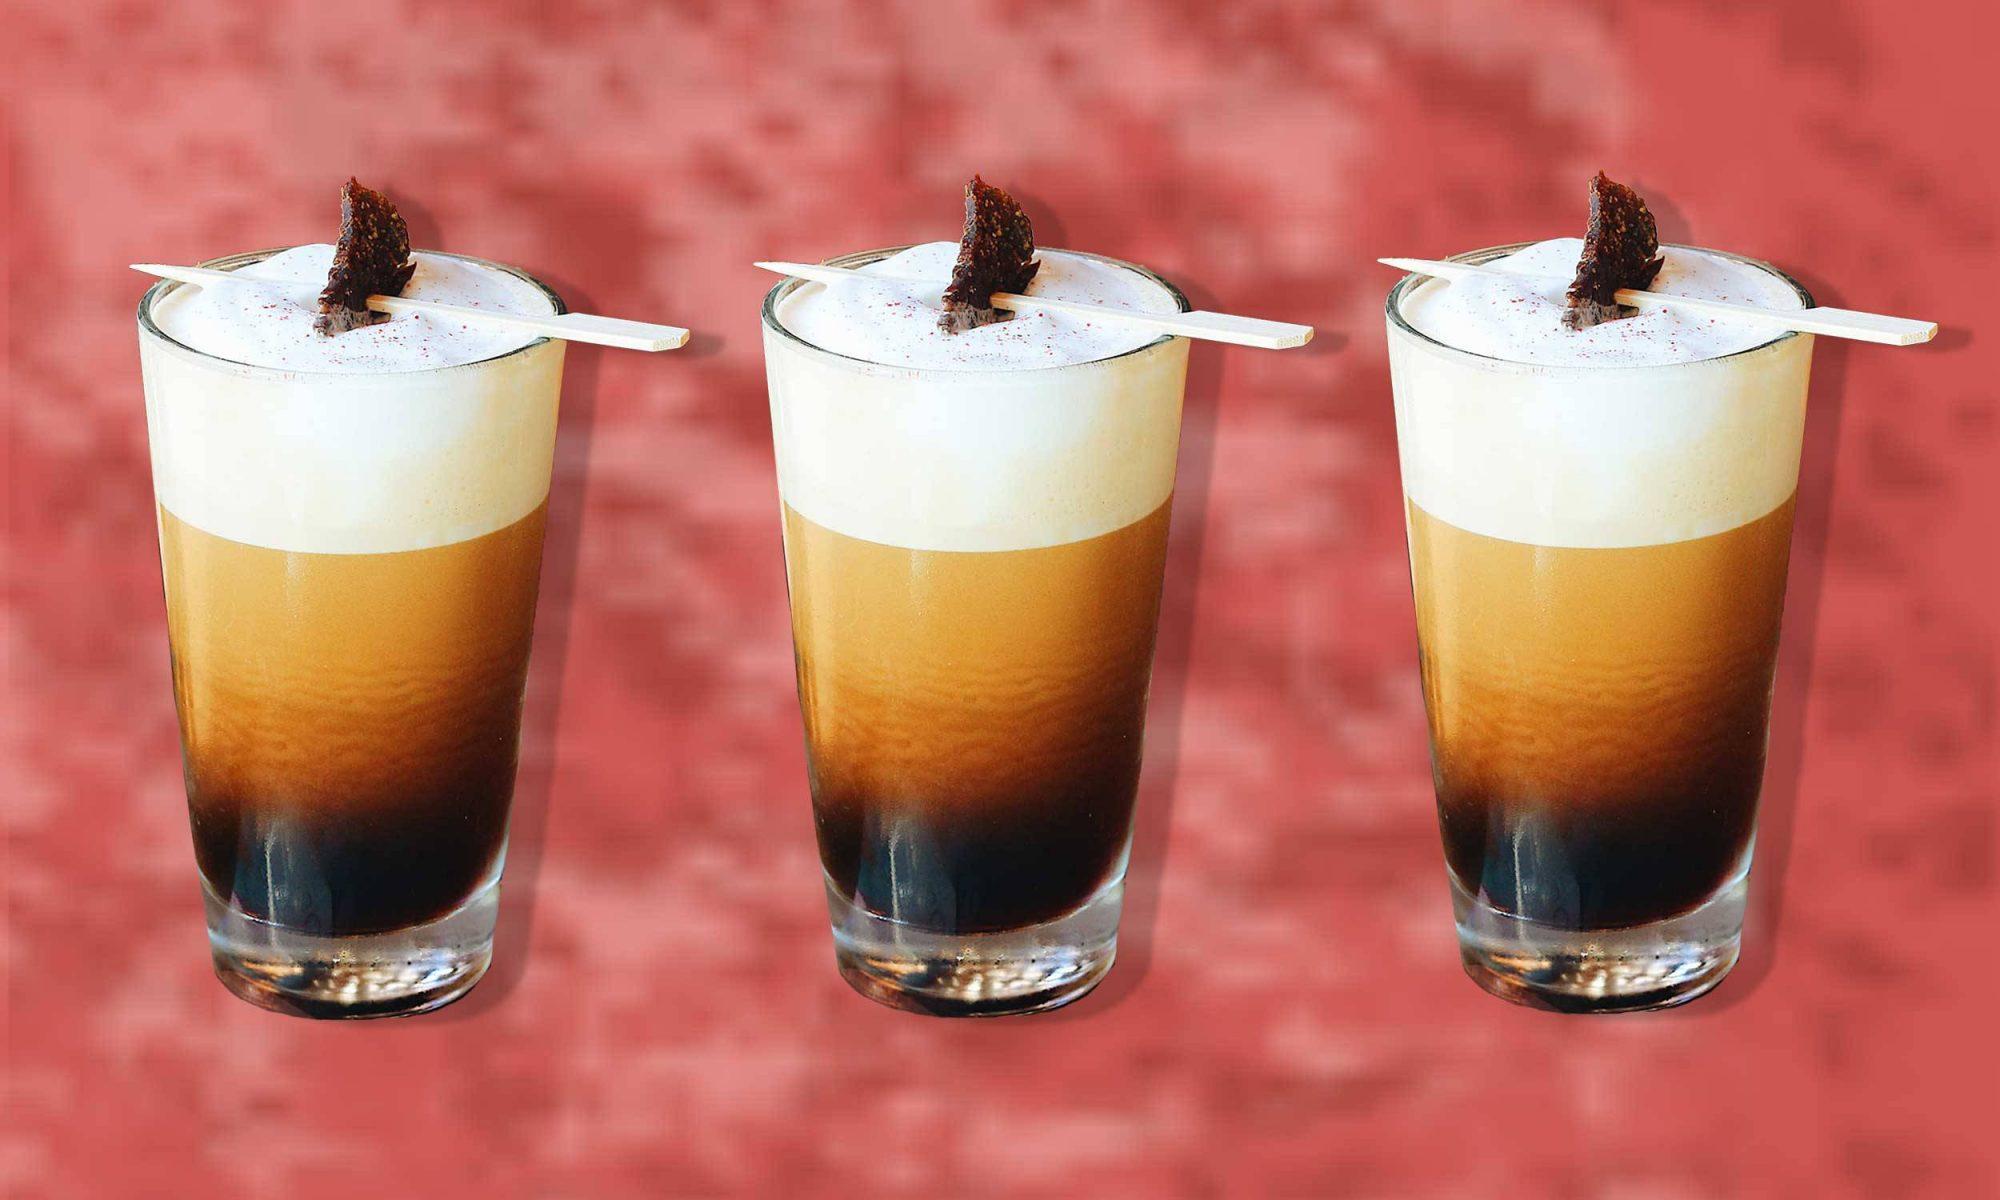 EC: Starbucks' New Drink Combines Beef Jerky and Cold Brew